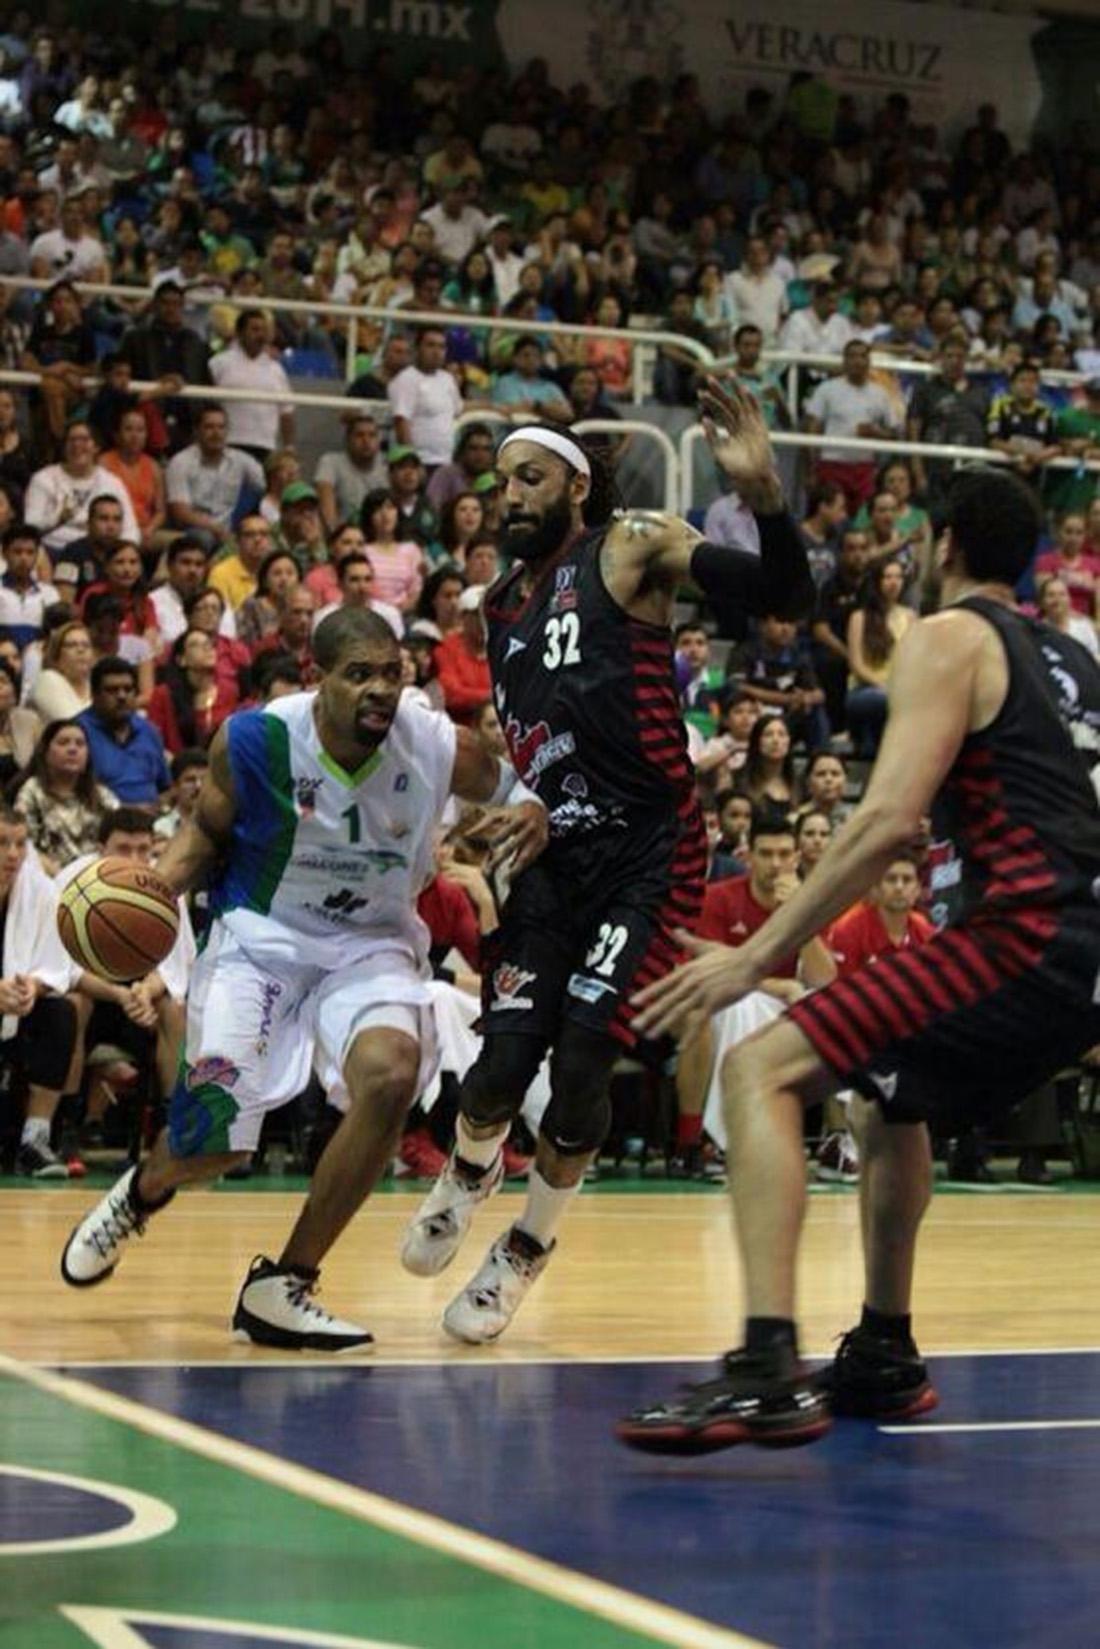 H ROJOS VS XALAPA en viva basquet